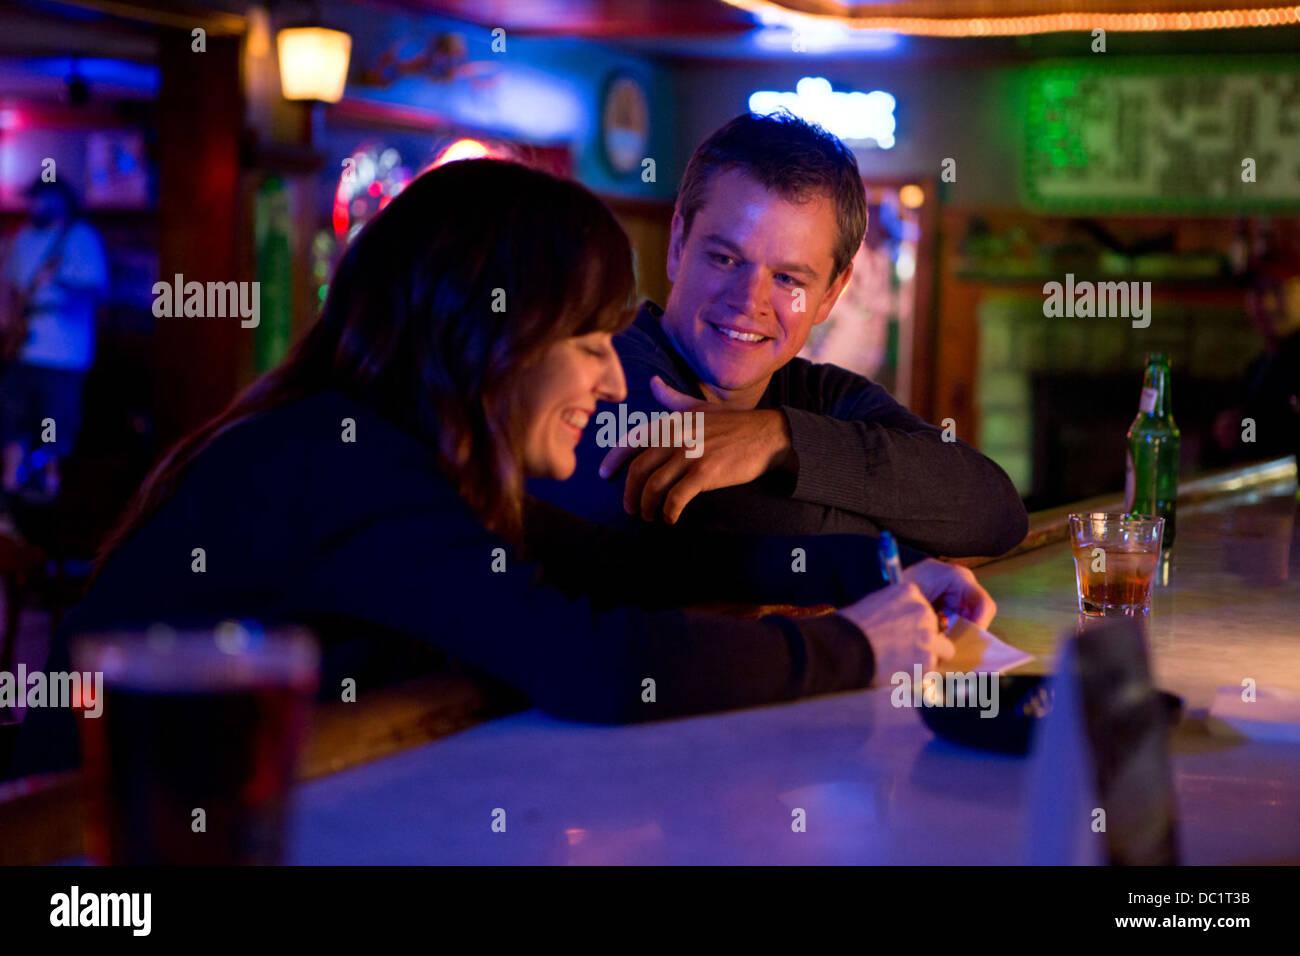 PROMISED LAND (2012) ROSEMARIE DEWITT MATT DAMON GUS VAN SANT (DIR) 007 MOVIESTORE COLLECTION LTD - Stock Image